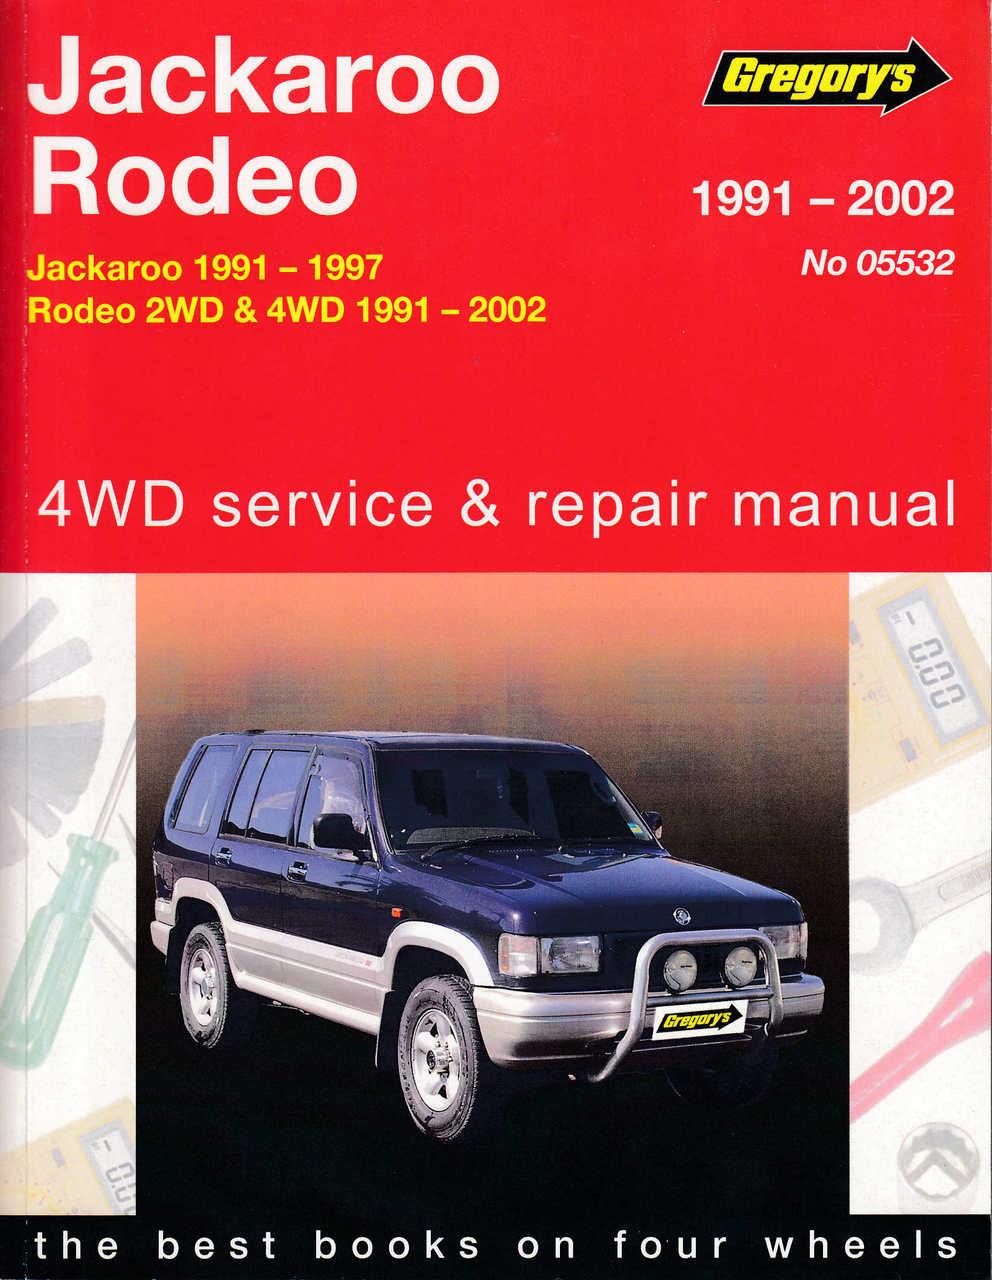 holden jackaroo and holden rodeo 1991 2002 workshop manual rh automotobookshop com au Holden Rodeo 4x4 1997 Holden Rodeo